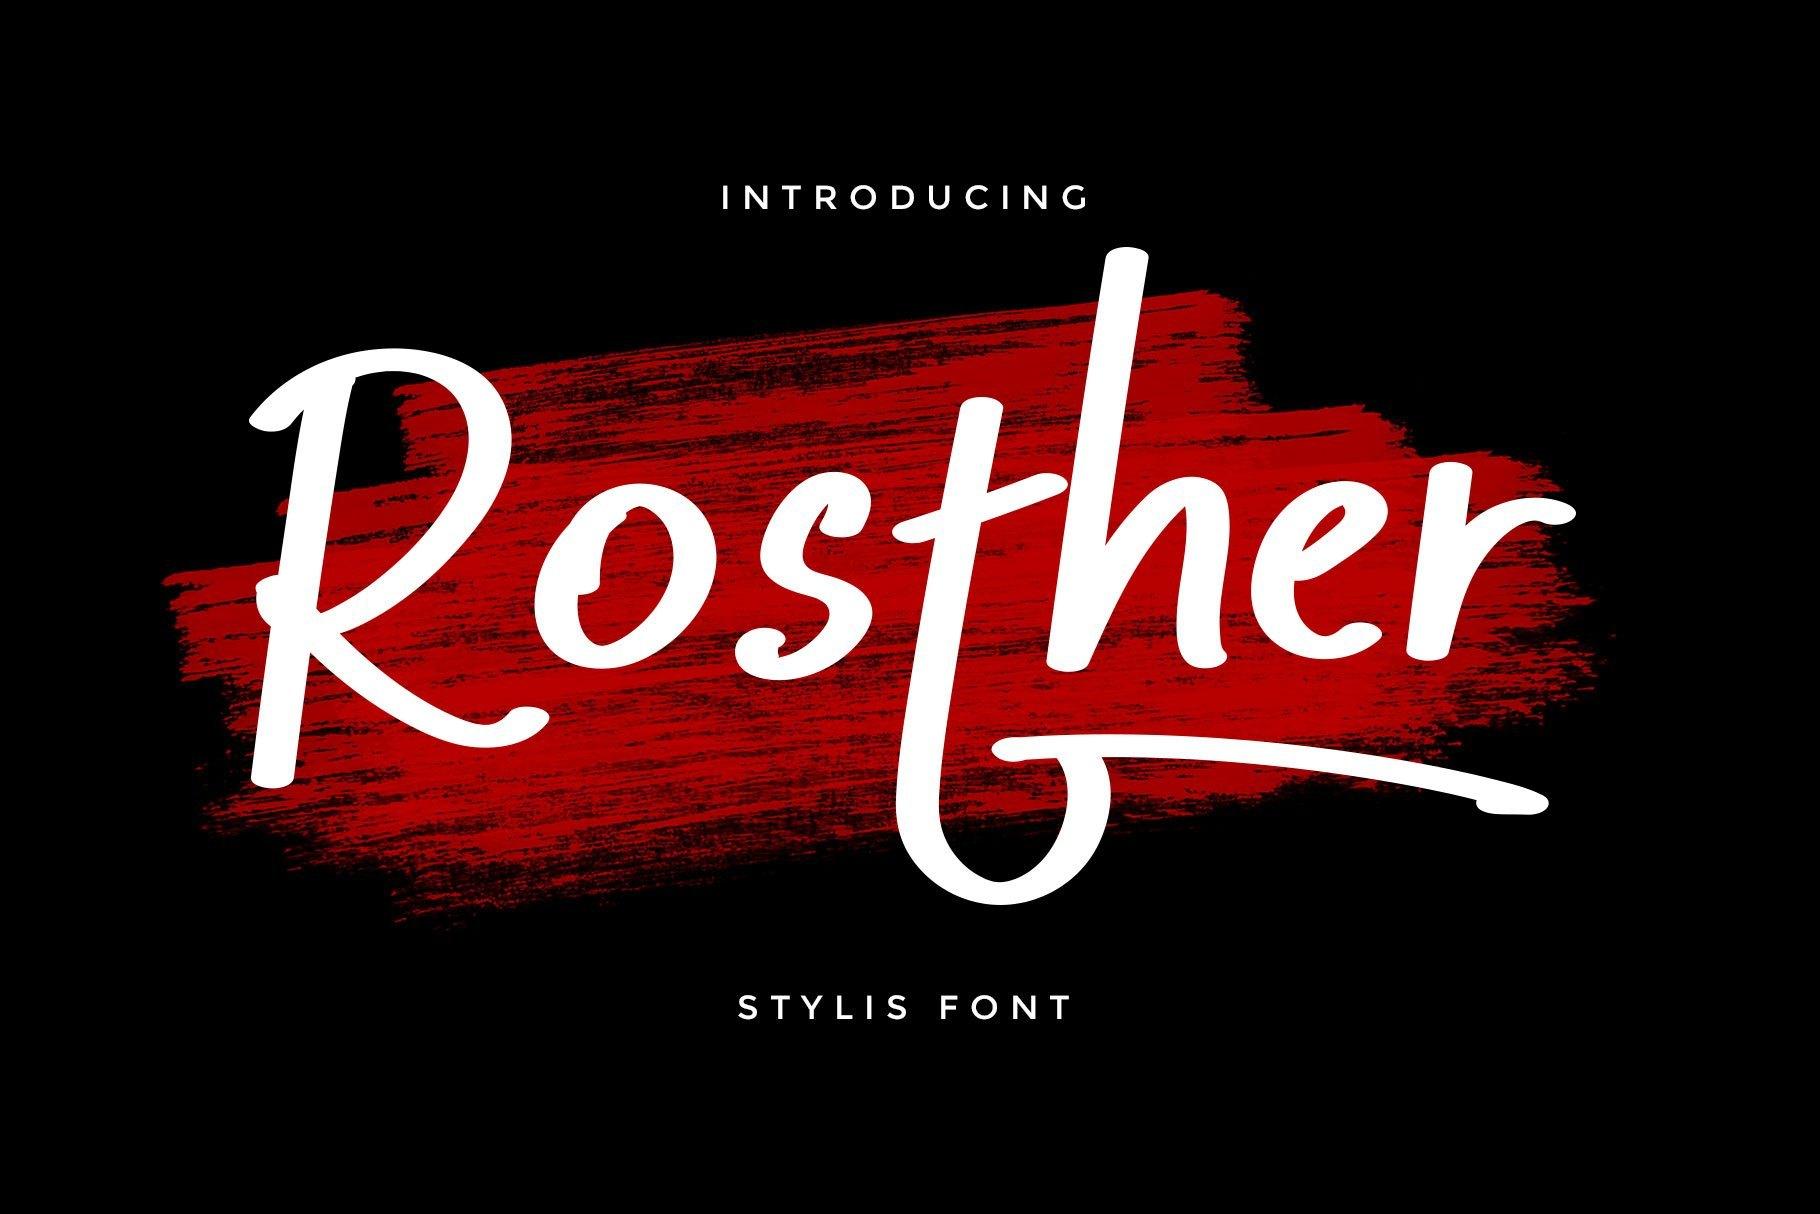 Rosther-Bold-Script-Font